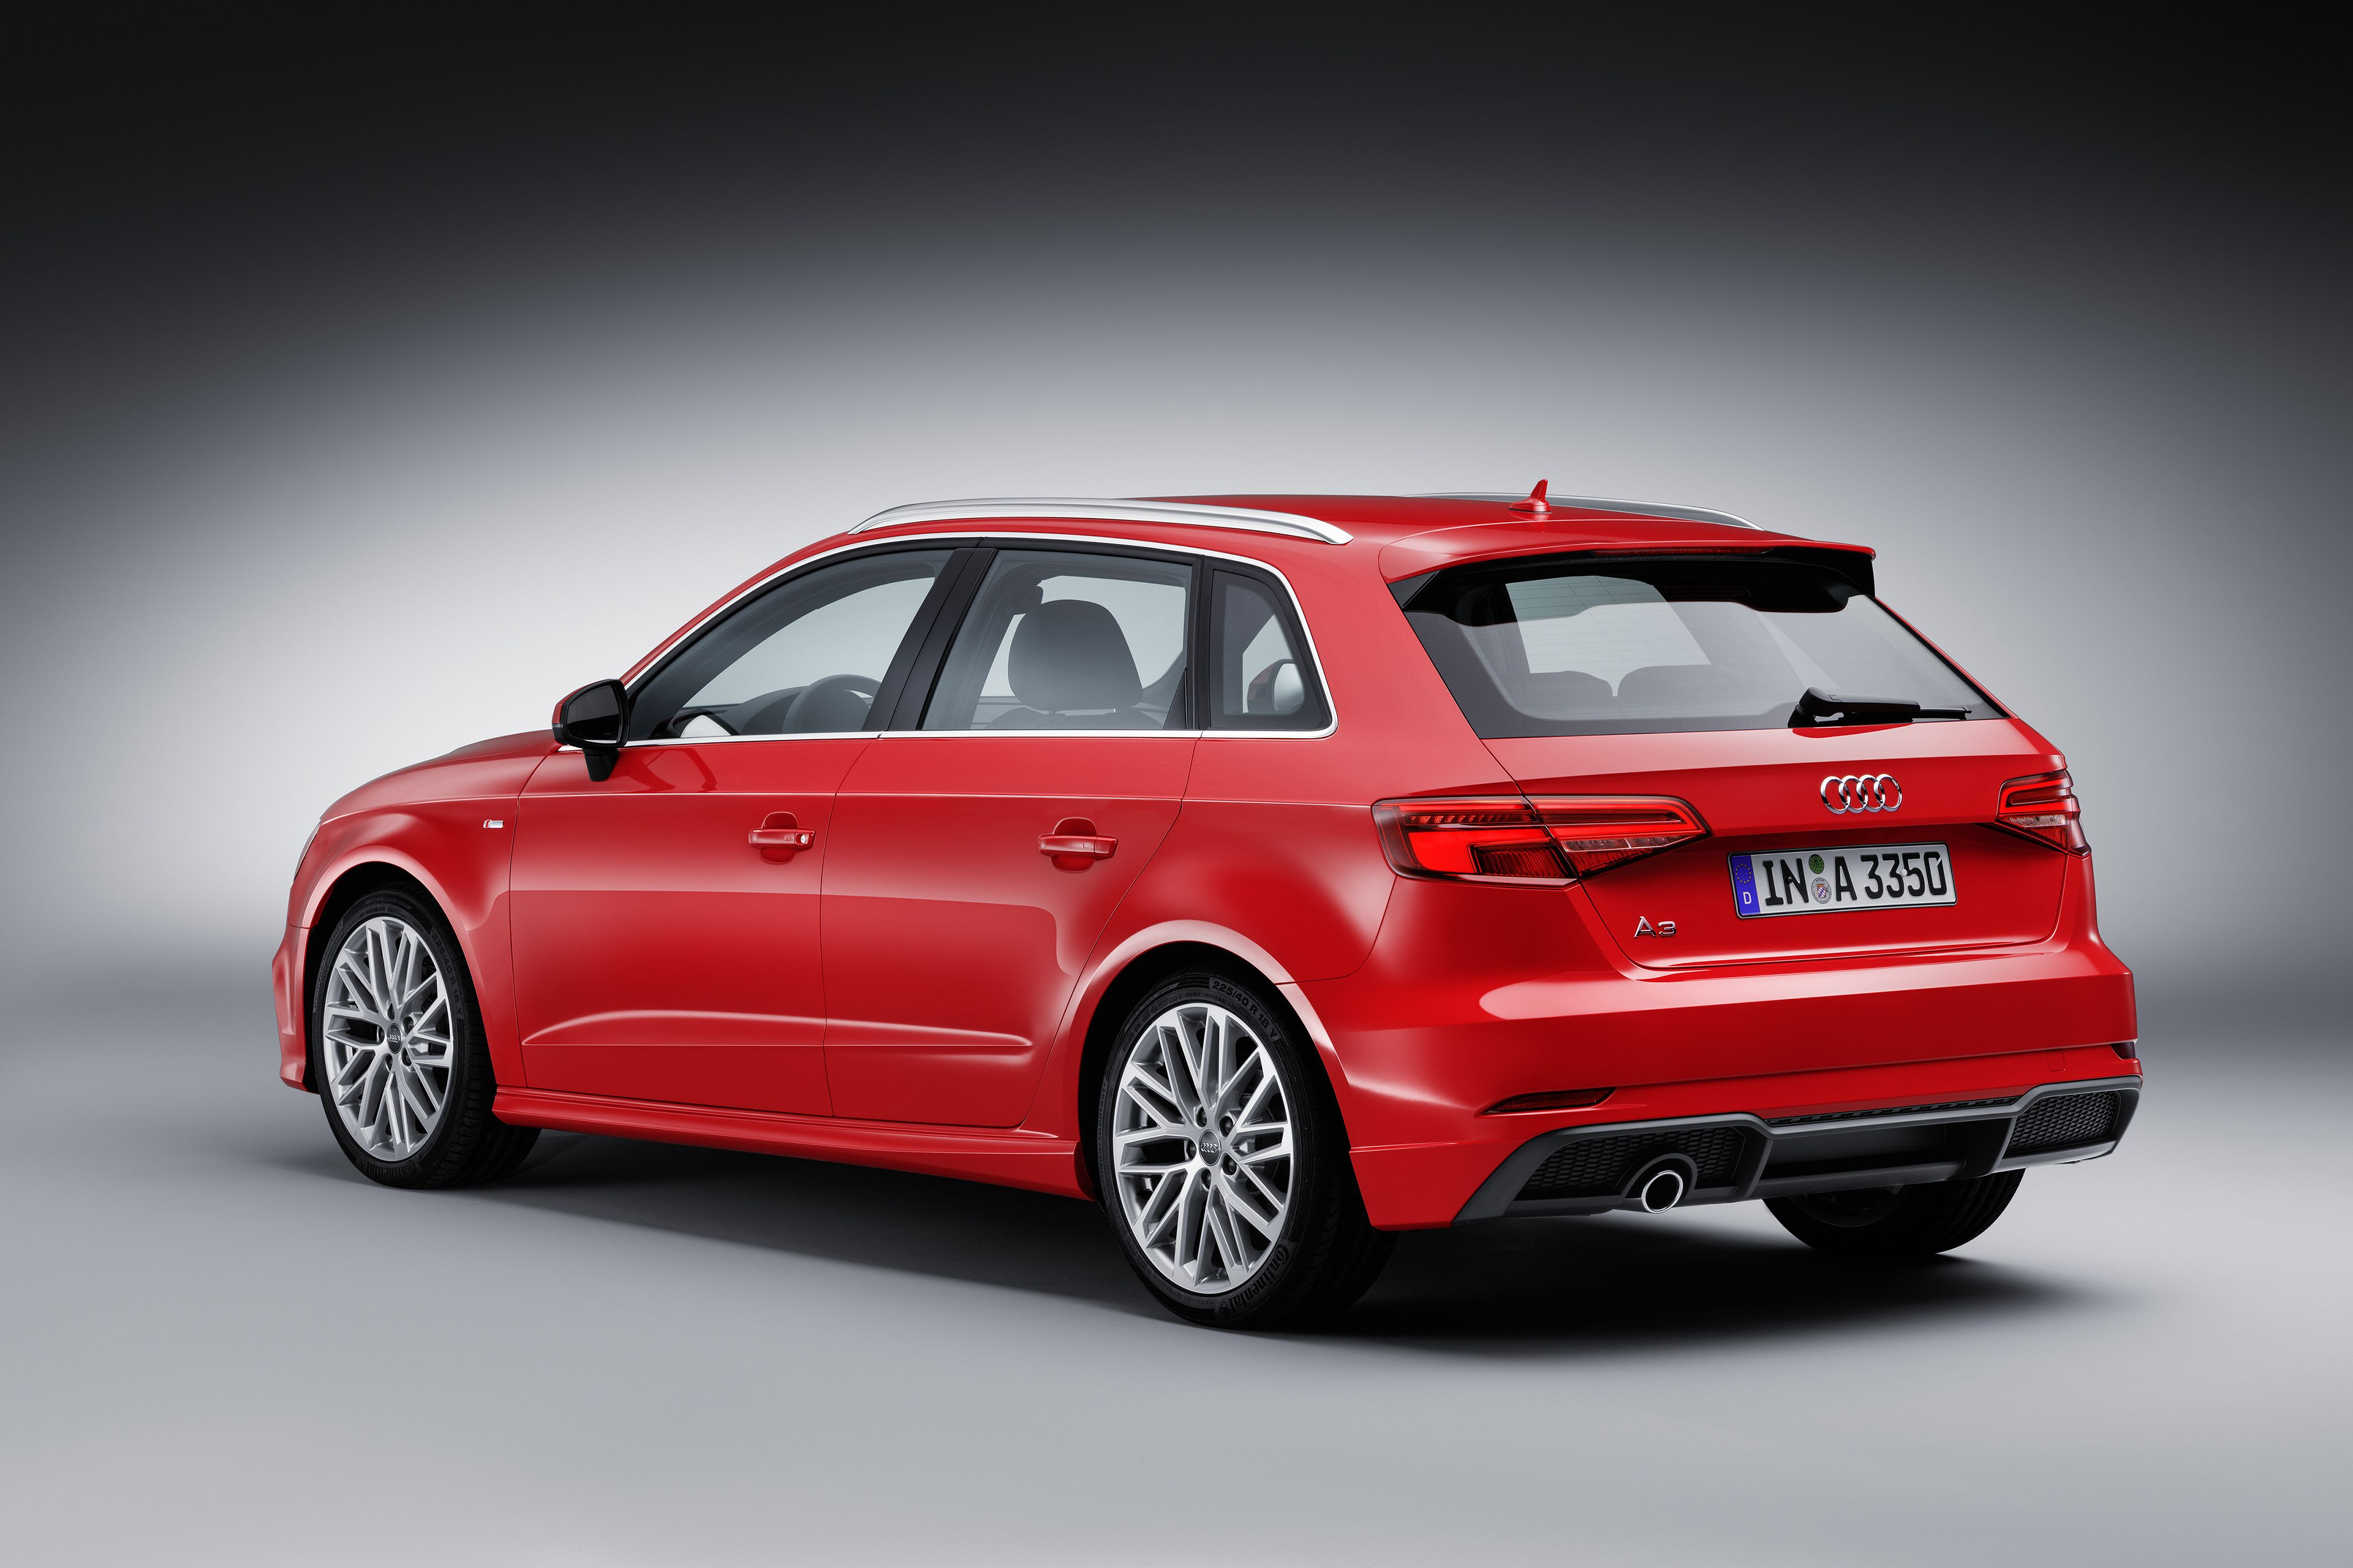 2016 A3 Sportback 2.0 TFSI S line Audi a3 sportback